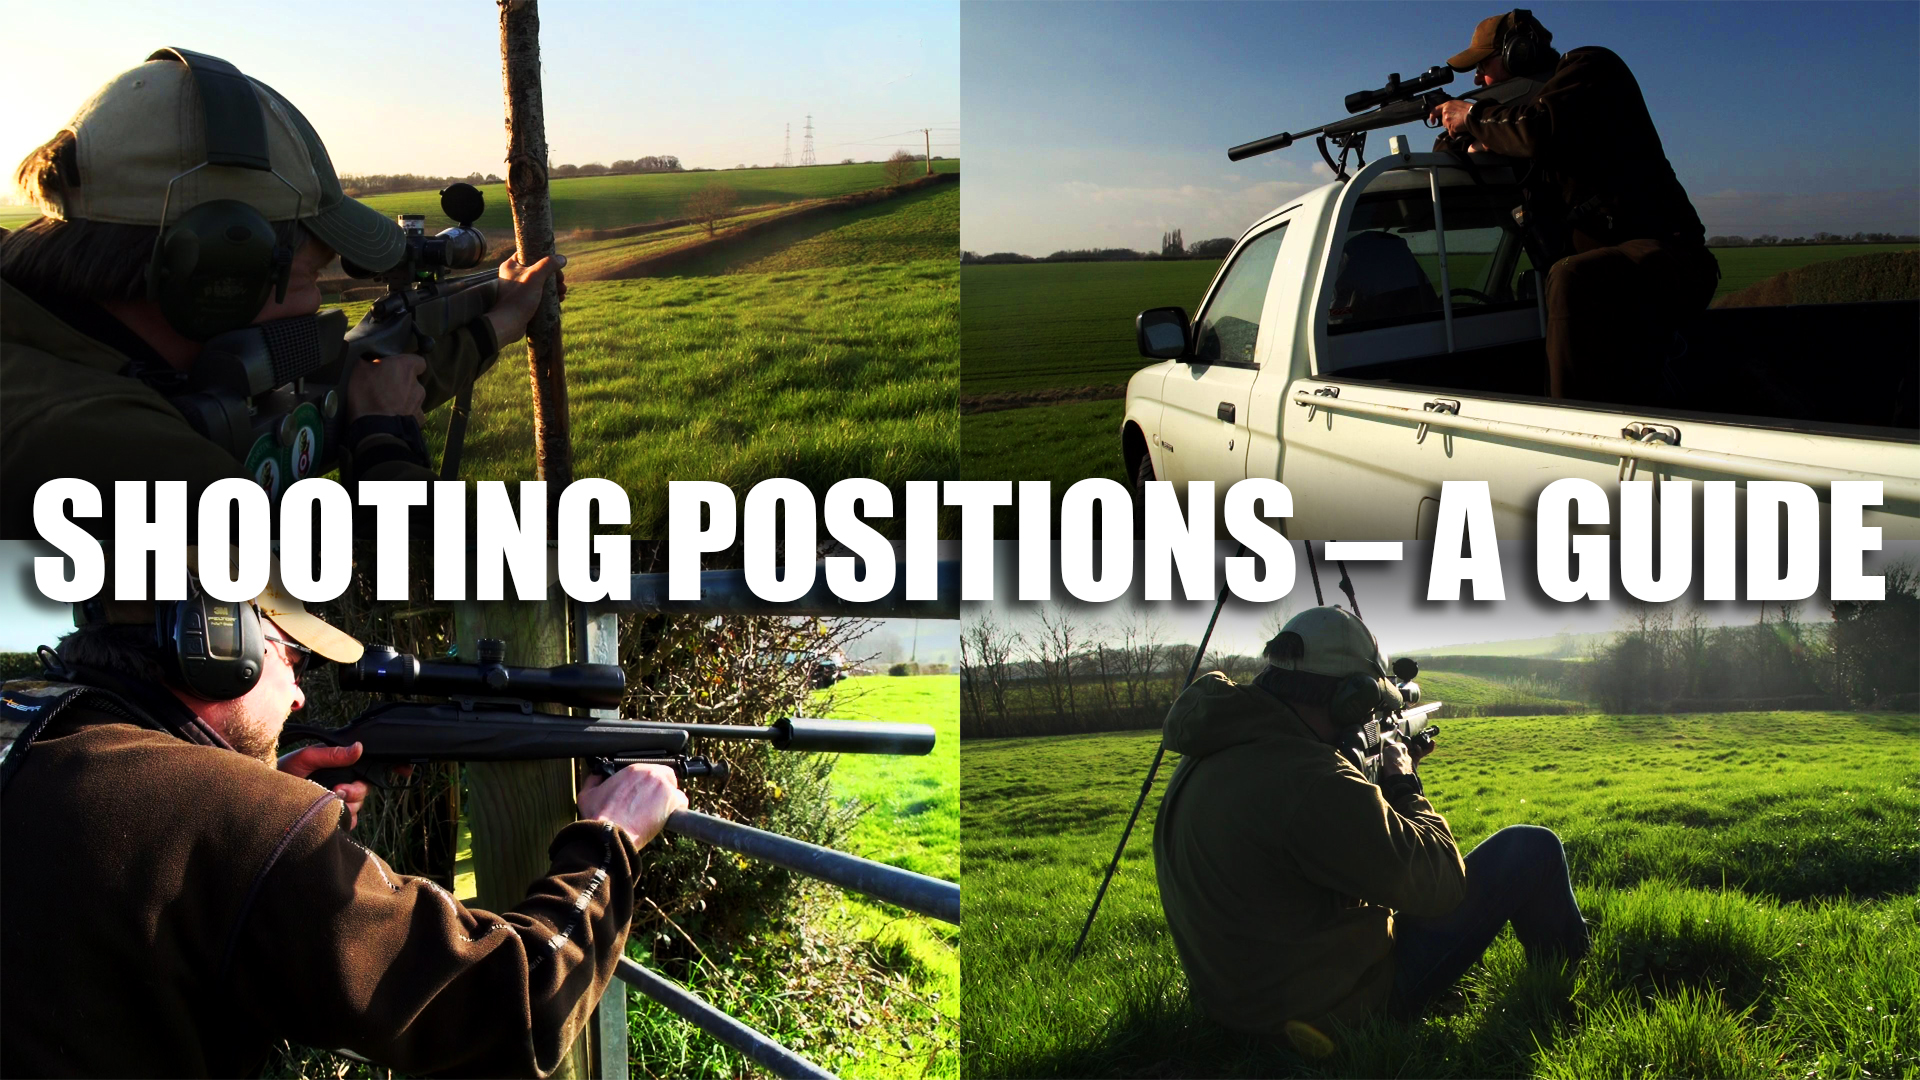 e382-rifle-positions